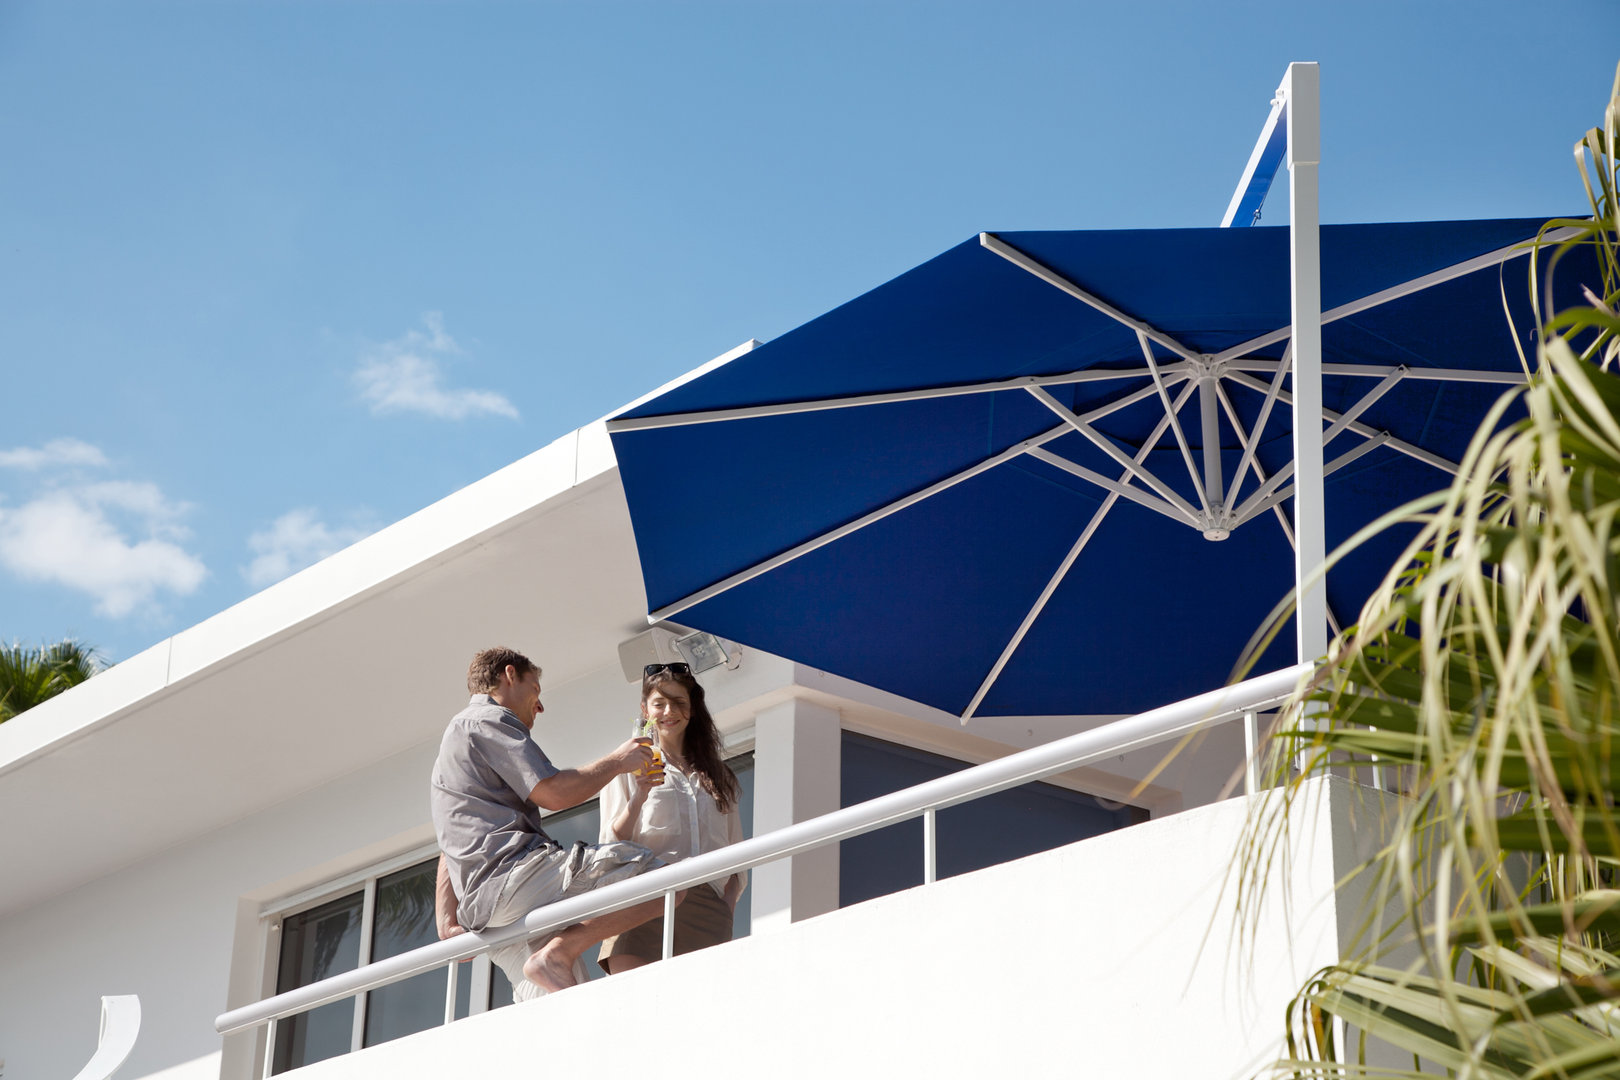 Sombrilla amalfi de m stil lateral con manivela todo en for Sombrillas para piscinas